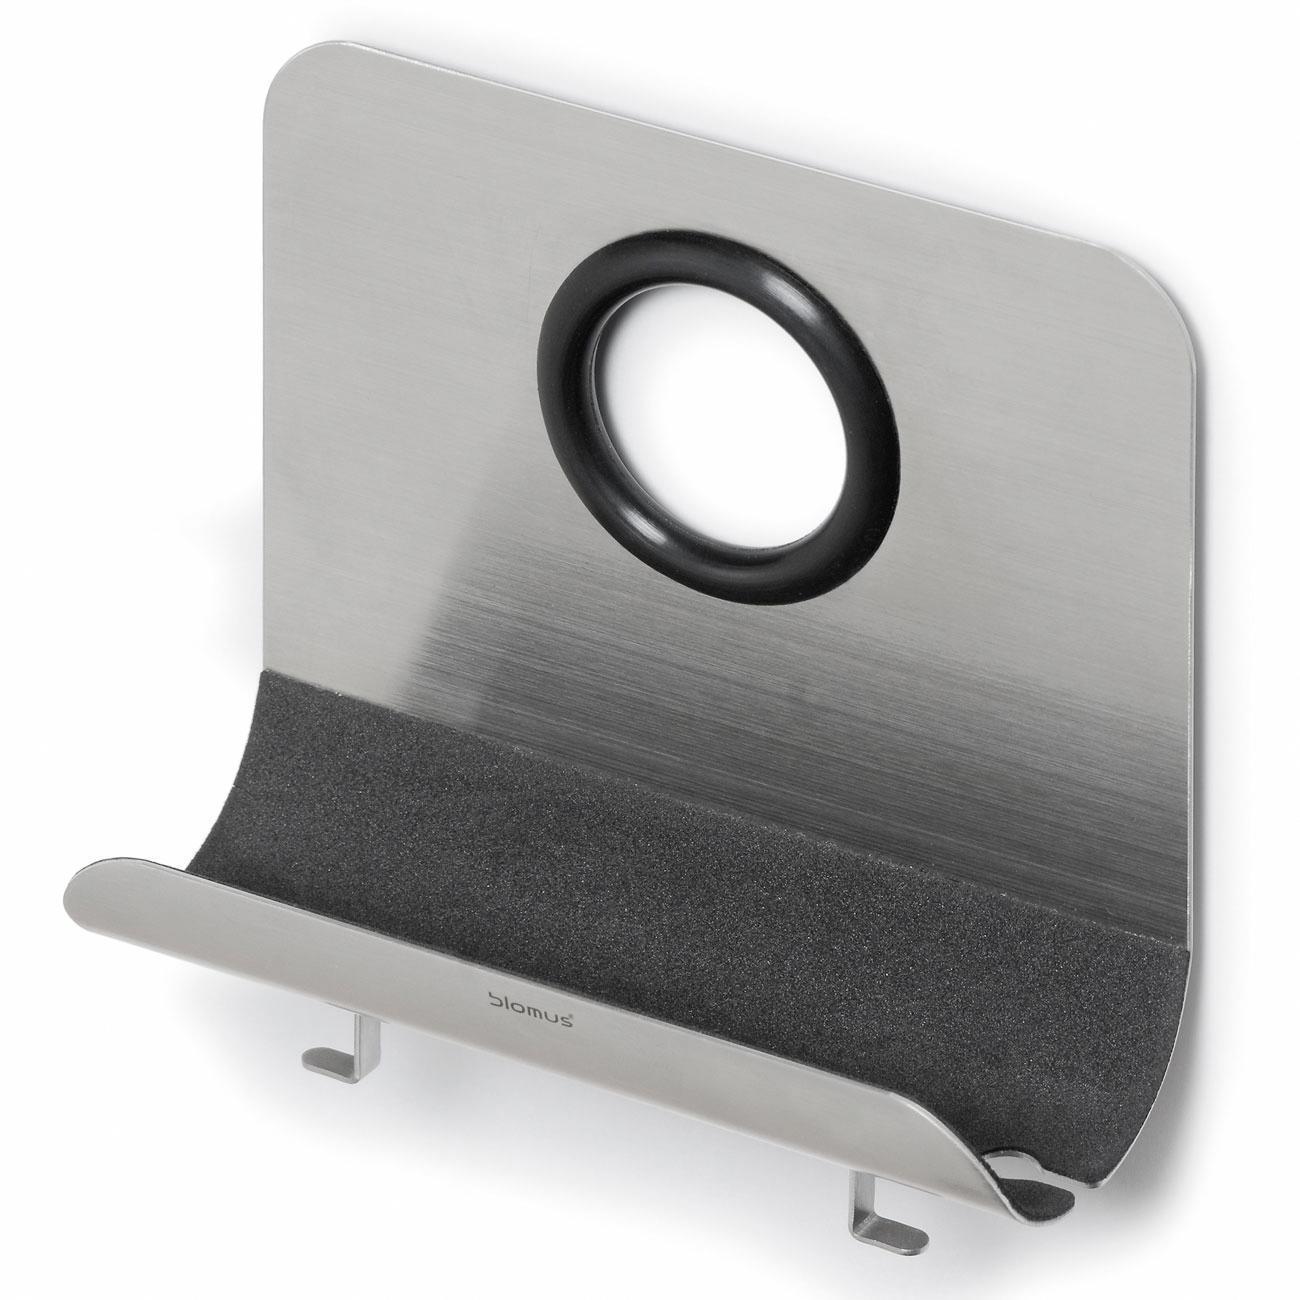 design ladestation movo 3 jahre garantie pro idee. Black Bedroom Furniture Sets. Home Design Ideas